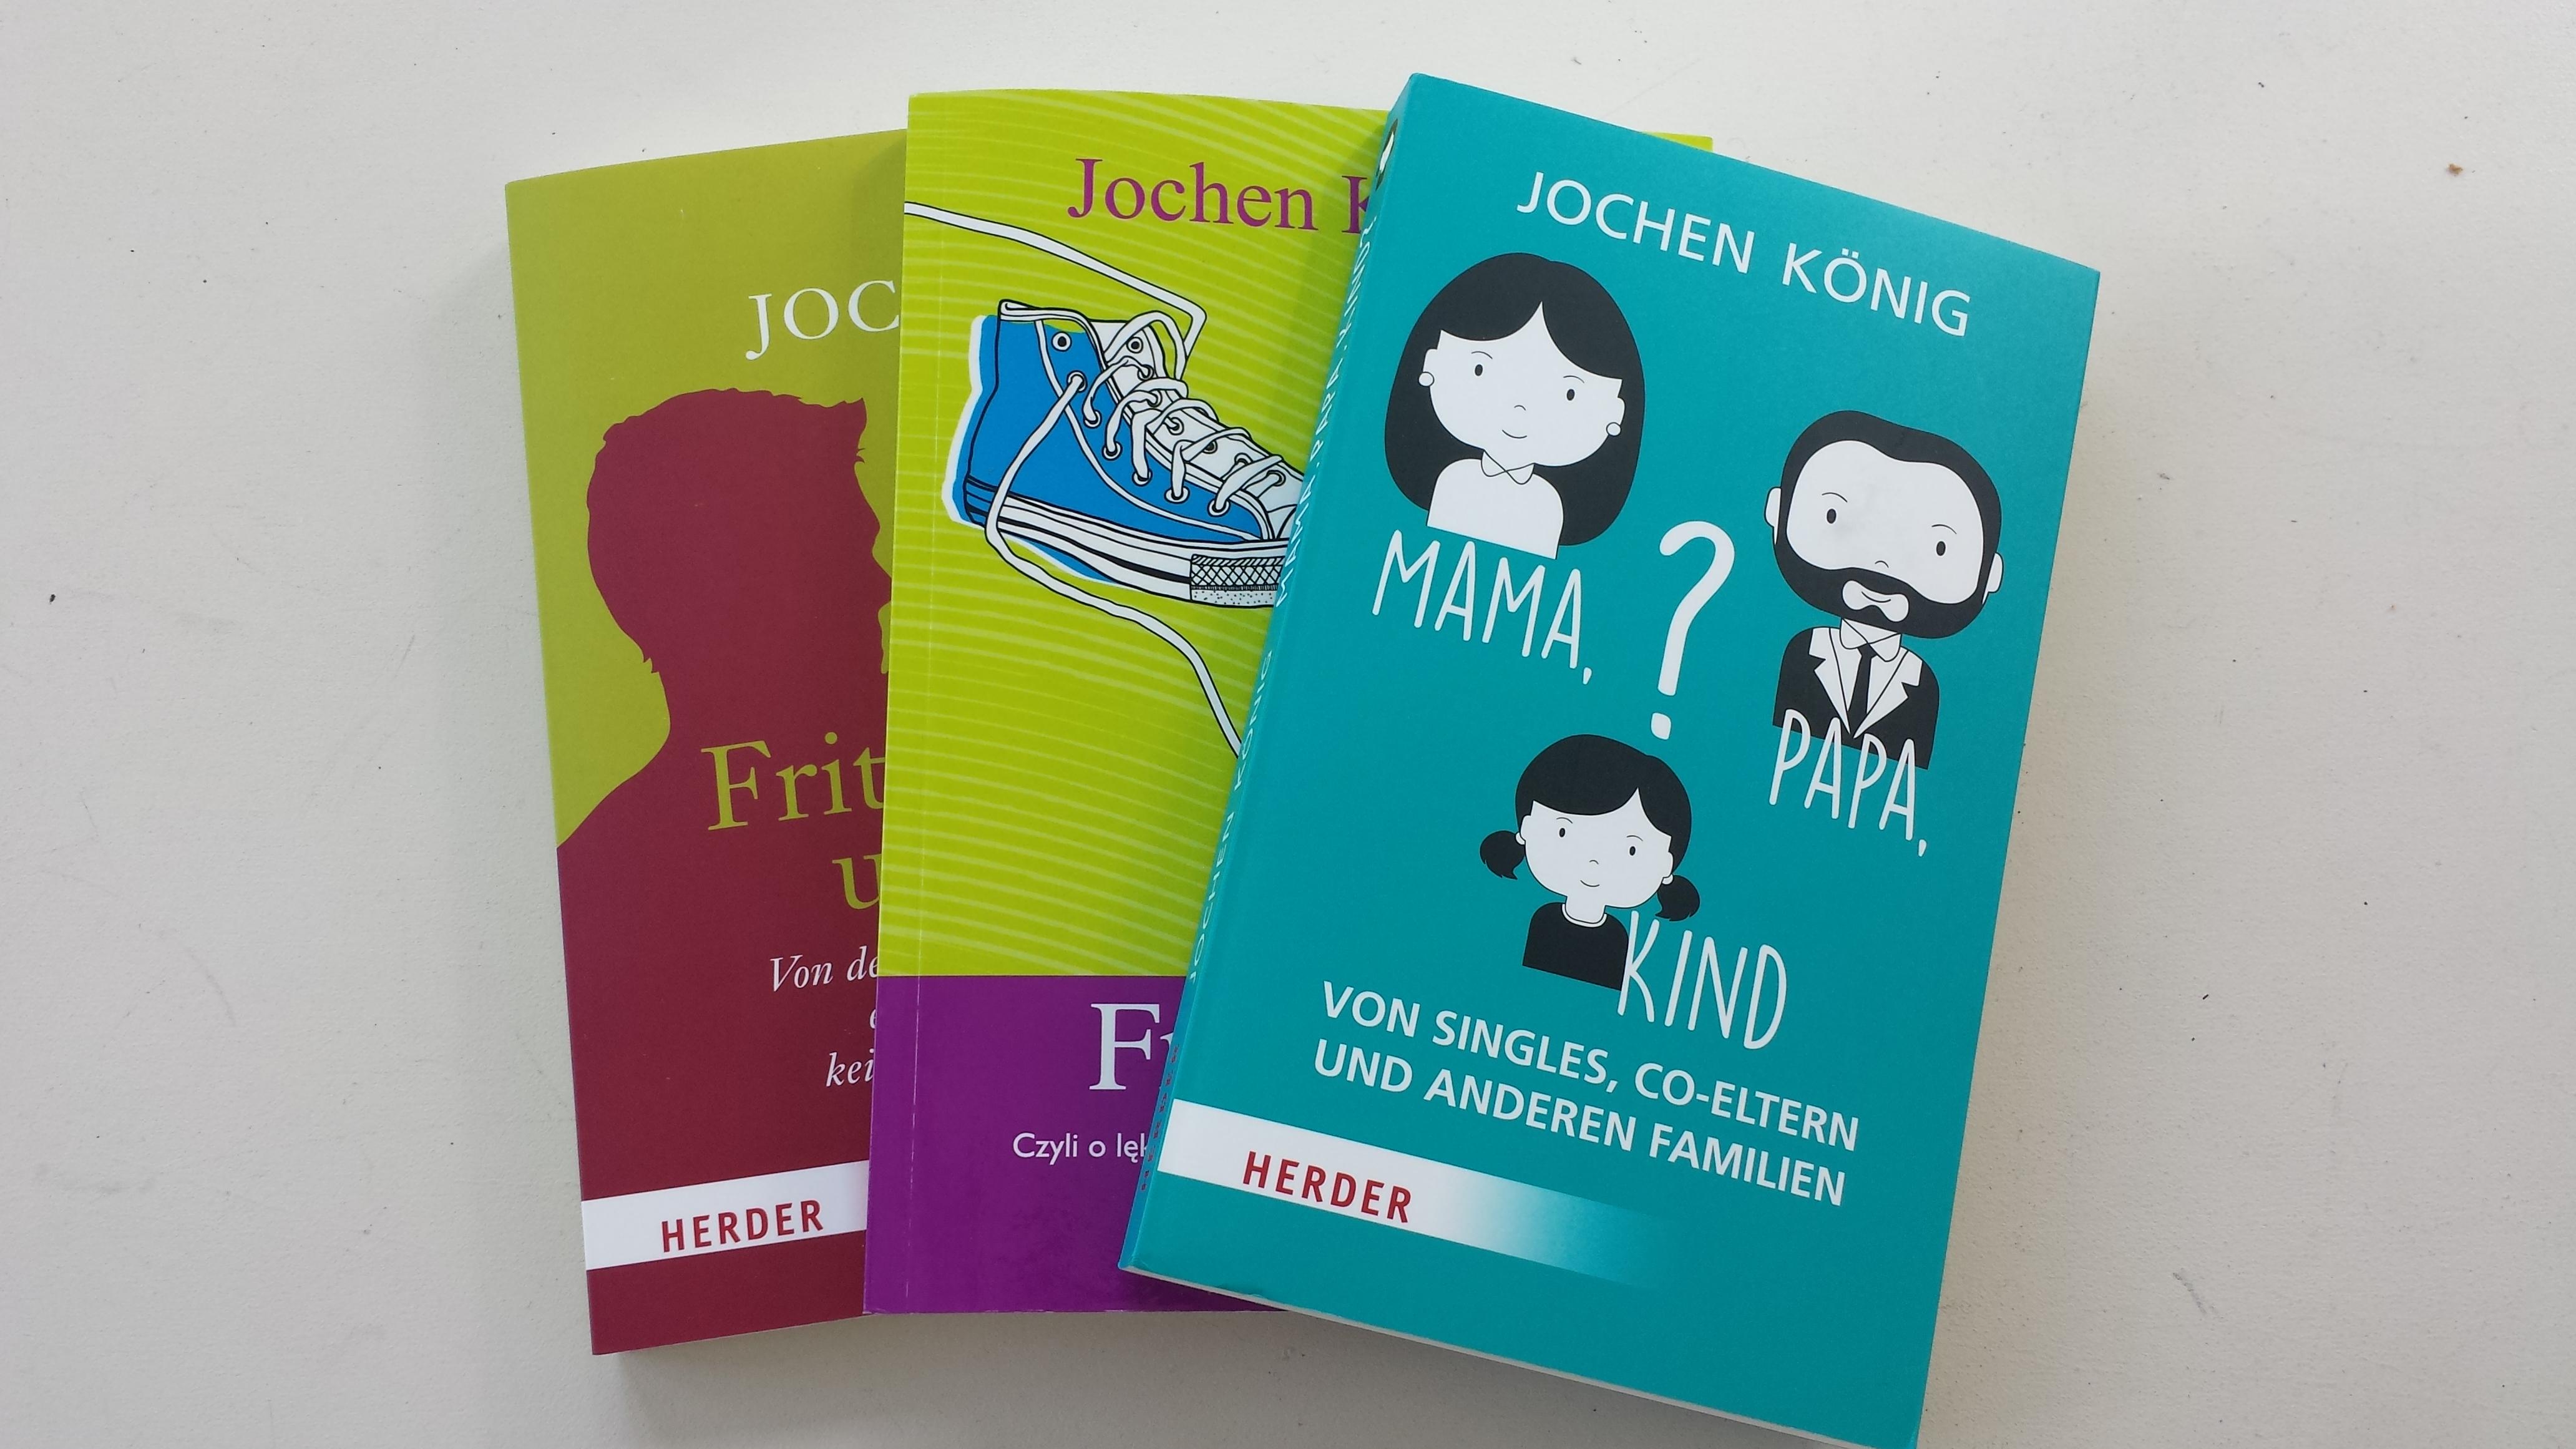 Jochen König Bücher